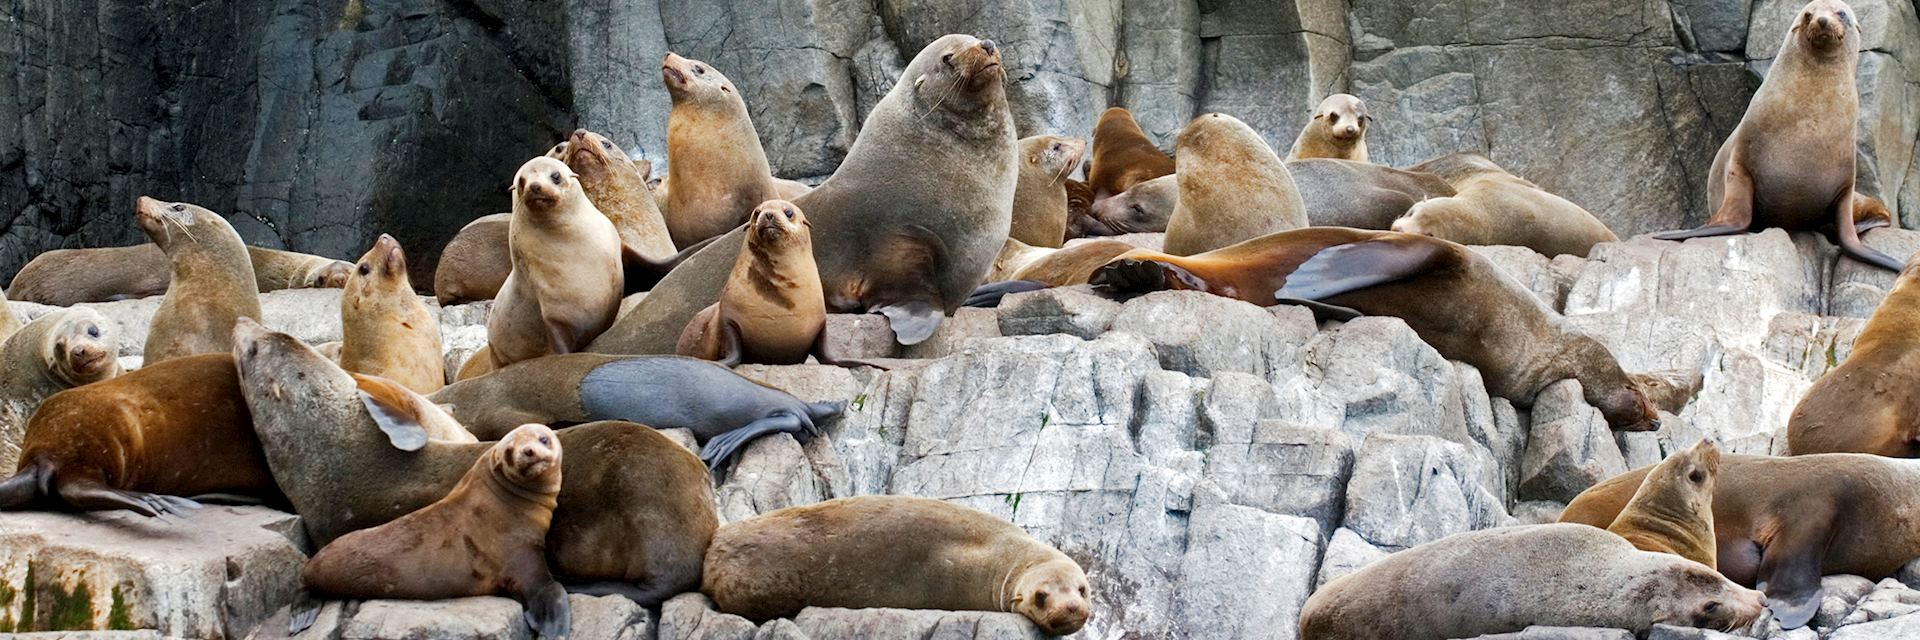 Fur seals, Bruny Island